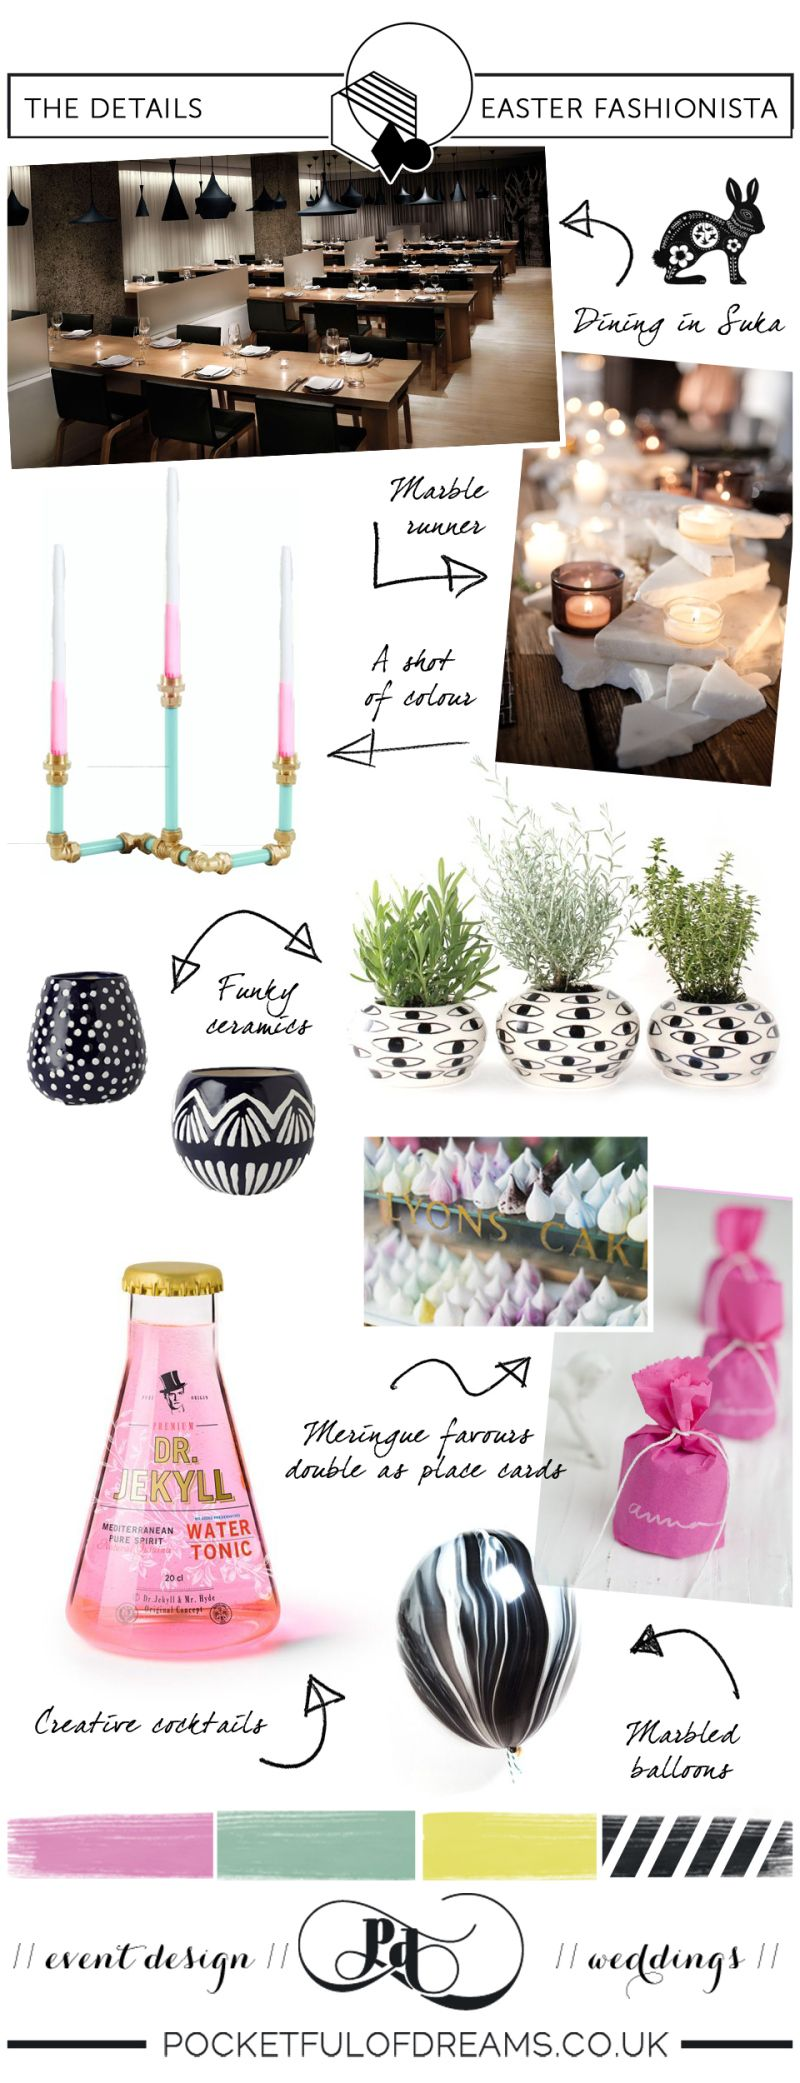 Bridal Inspiration Boards #72 ~ Easter Fashionista   Love My Dress® UK Wedding Blog